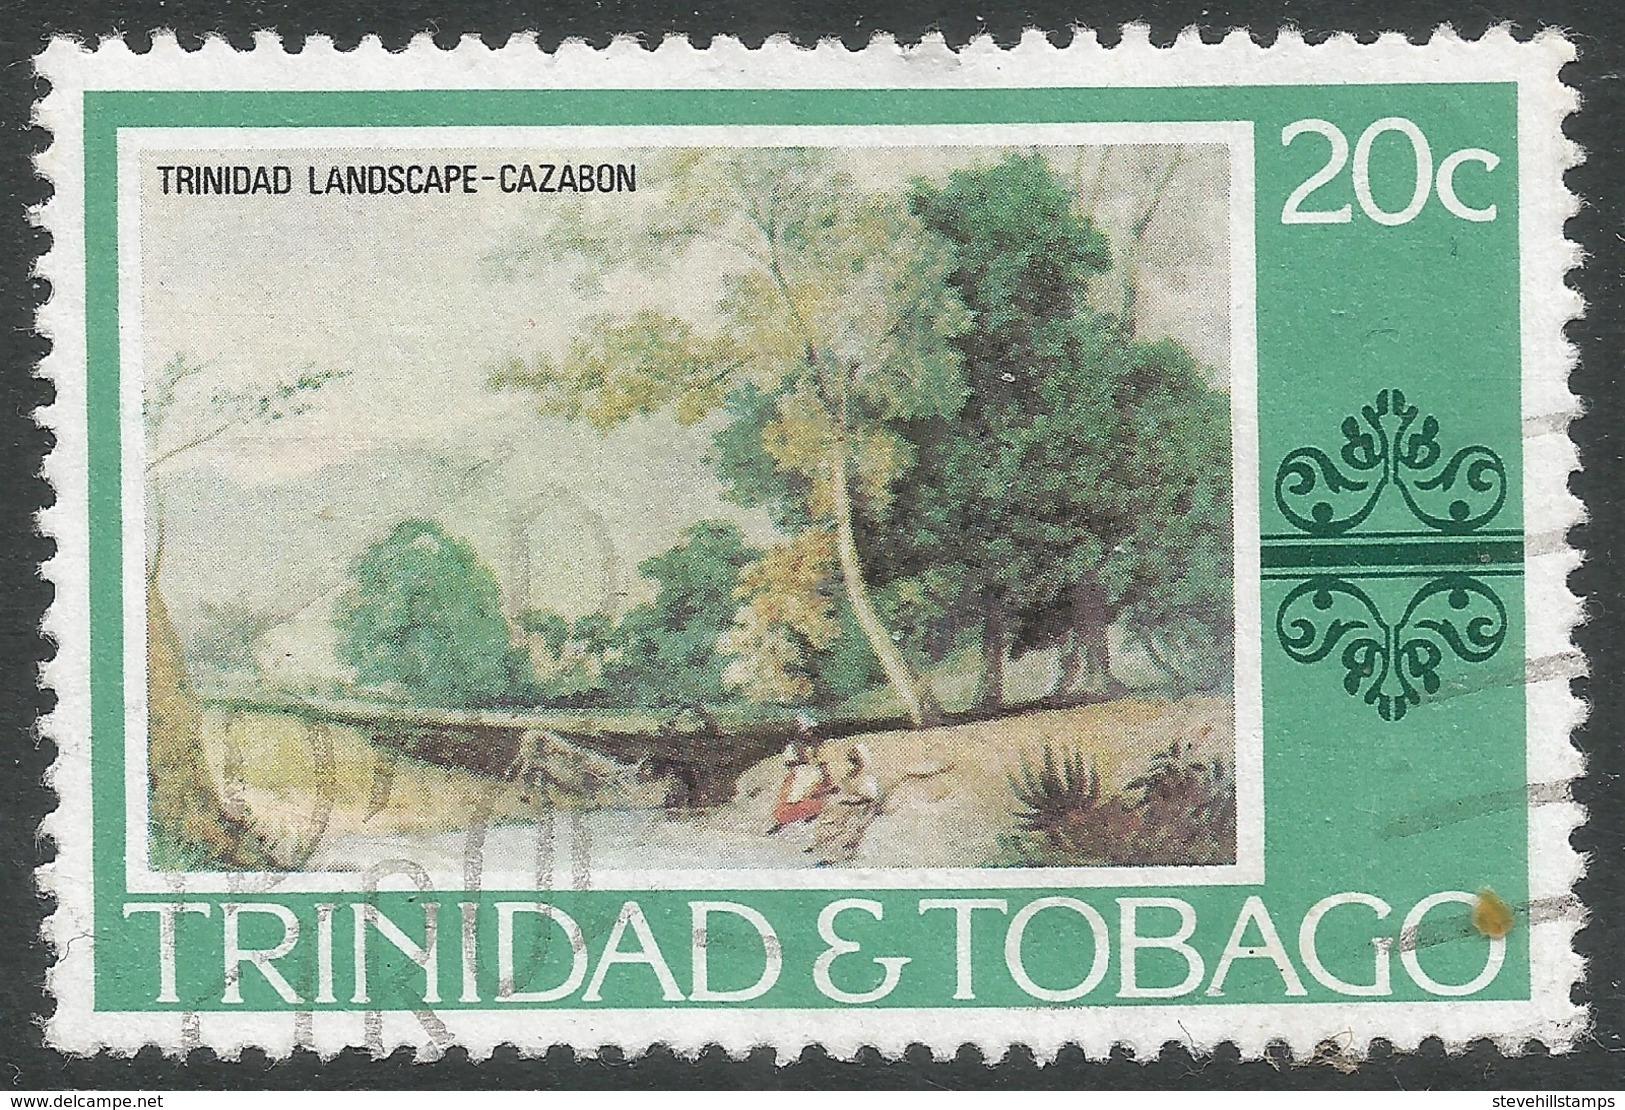 Trinidad & Tobago. 1976 Paintings, Hotels And Orchids. 20c Used. SG 485 - Trinidad & Tobago (1962-...)